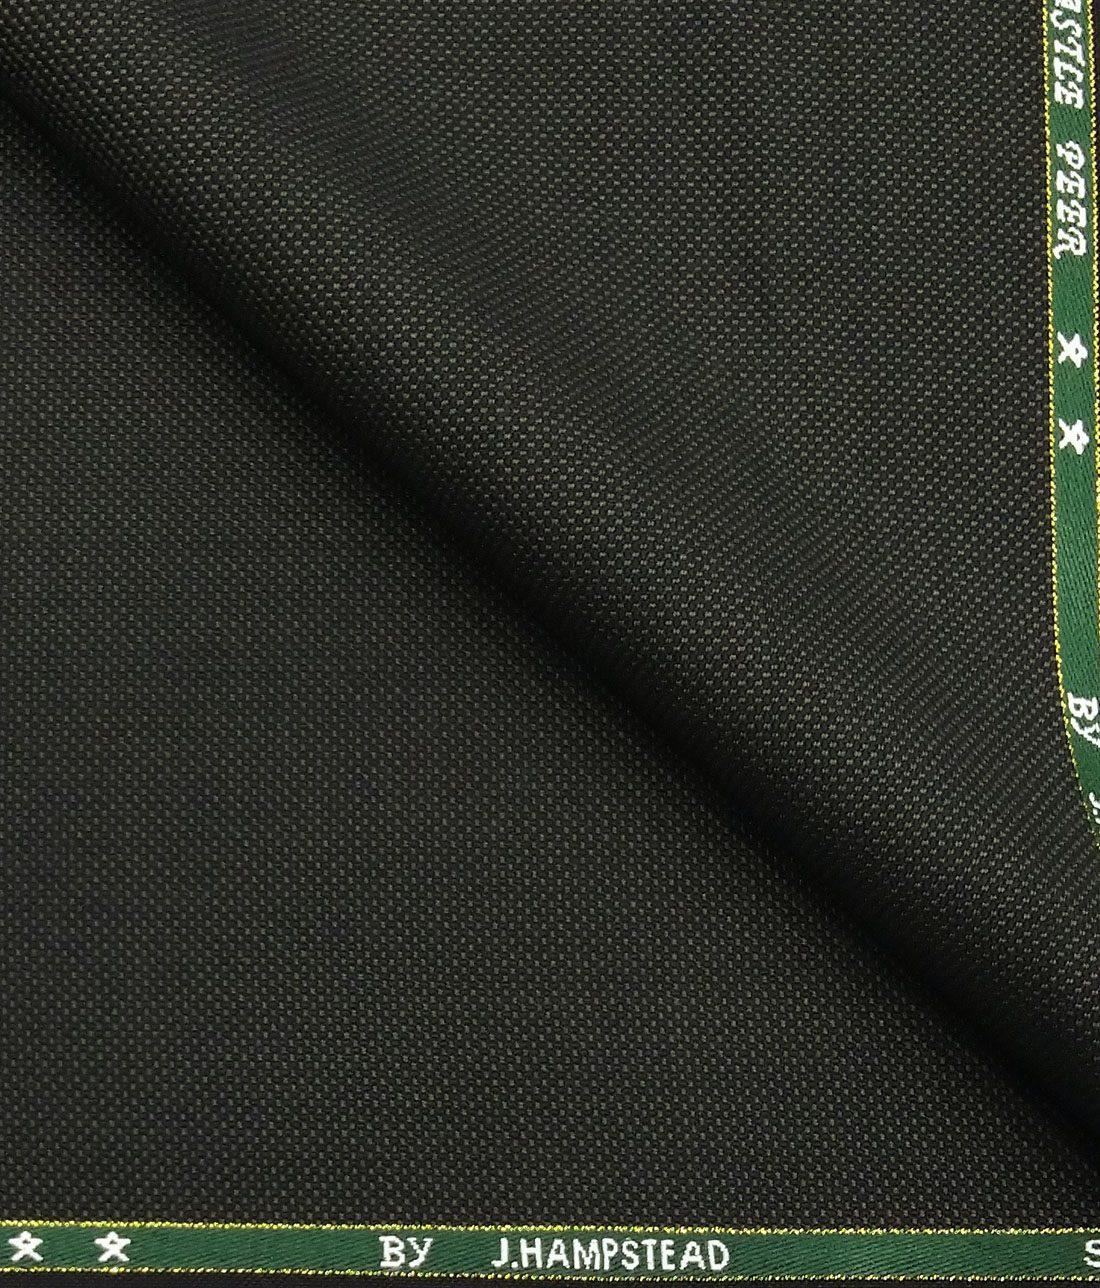 0279d83b0 J.Hampstead by Siyaram s Dark Green Structured Super 90 s 35% Merino Wool  Unstitched Fabric · Blazer or Suit